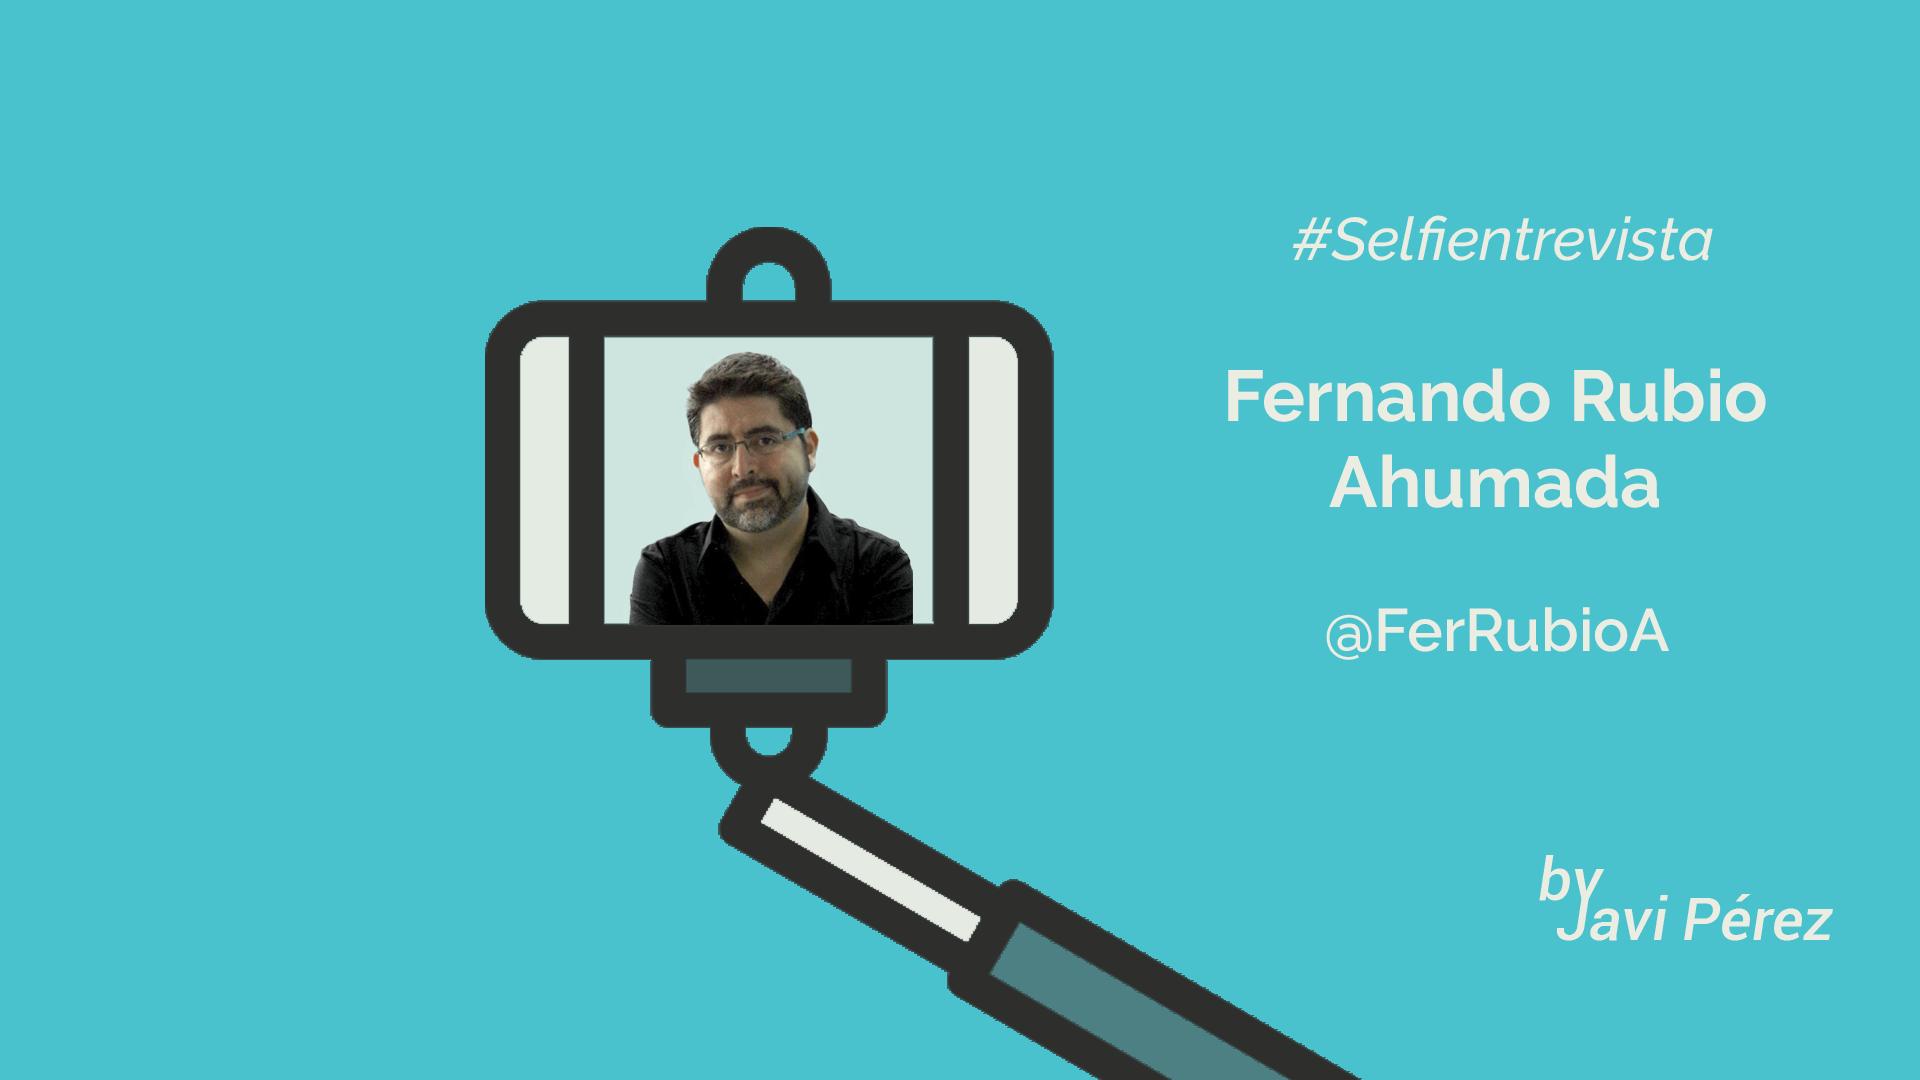 Twitter selfie entrevista a Fernando Rubio